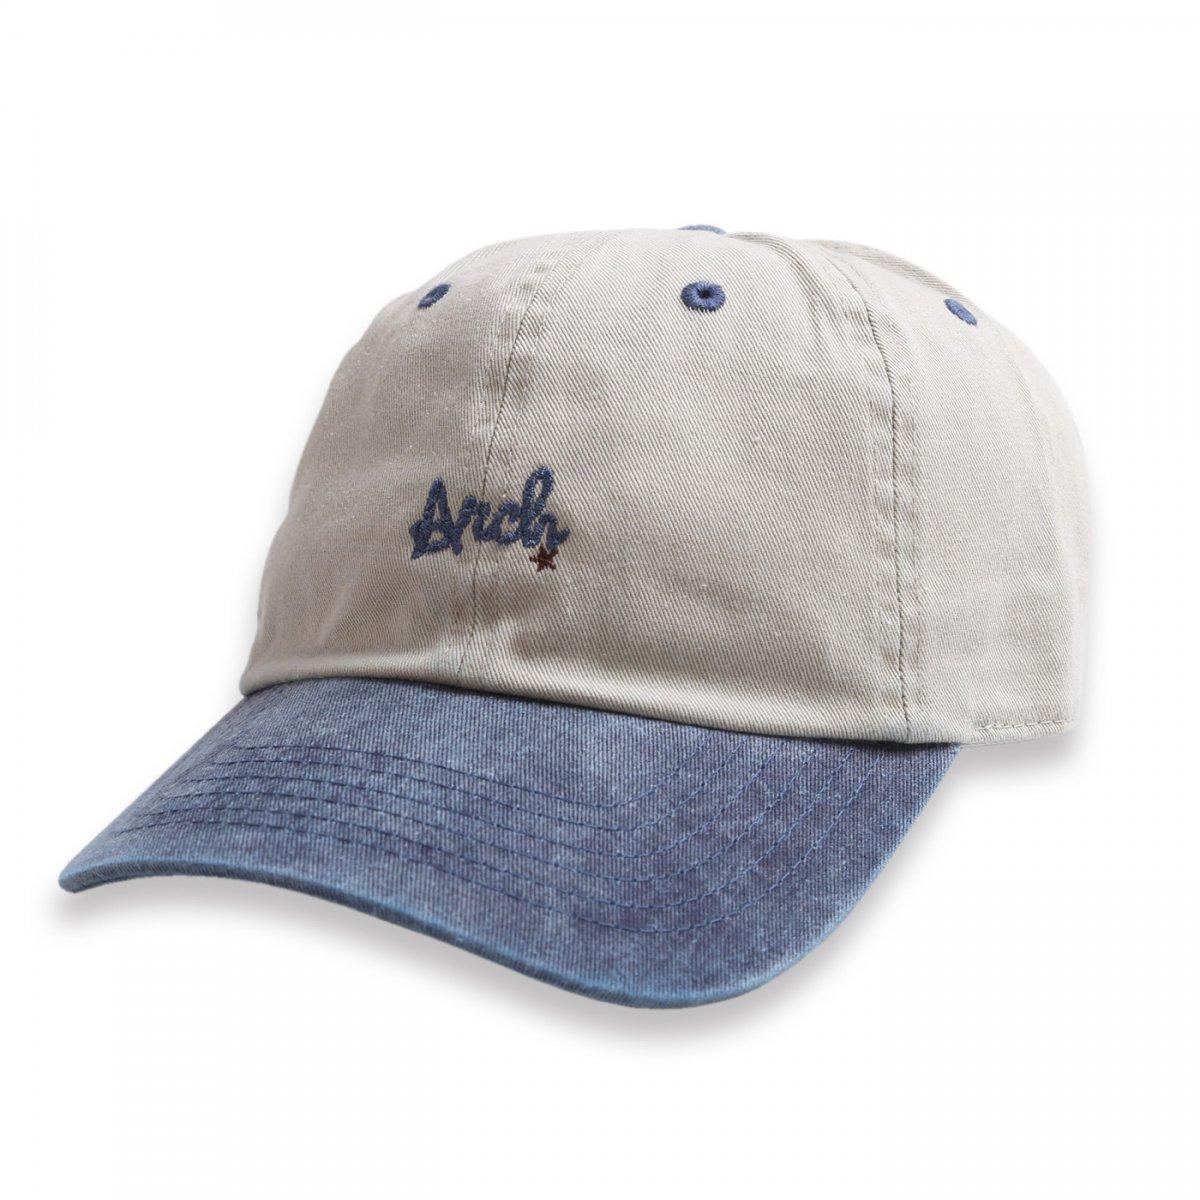 rope logo cap【sand/navy】